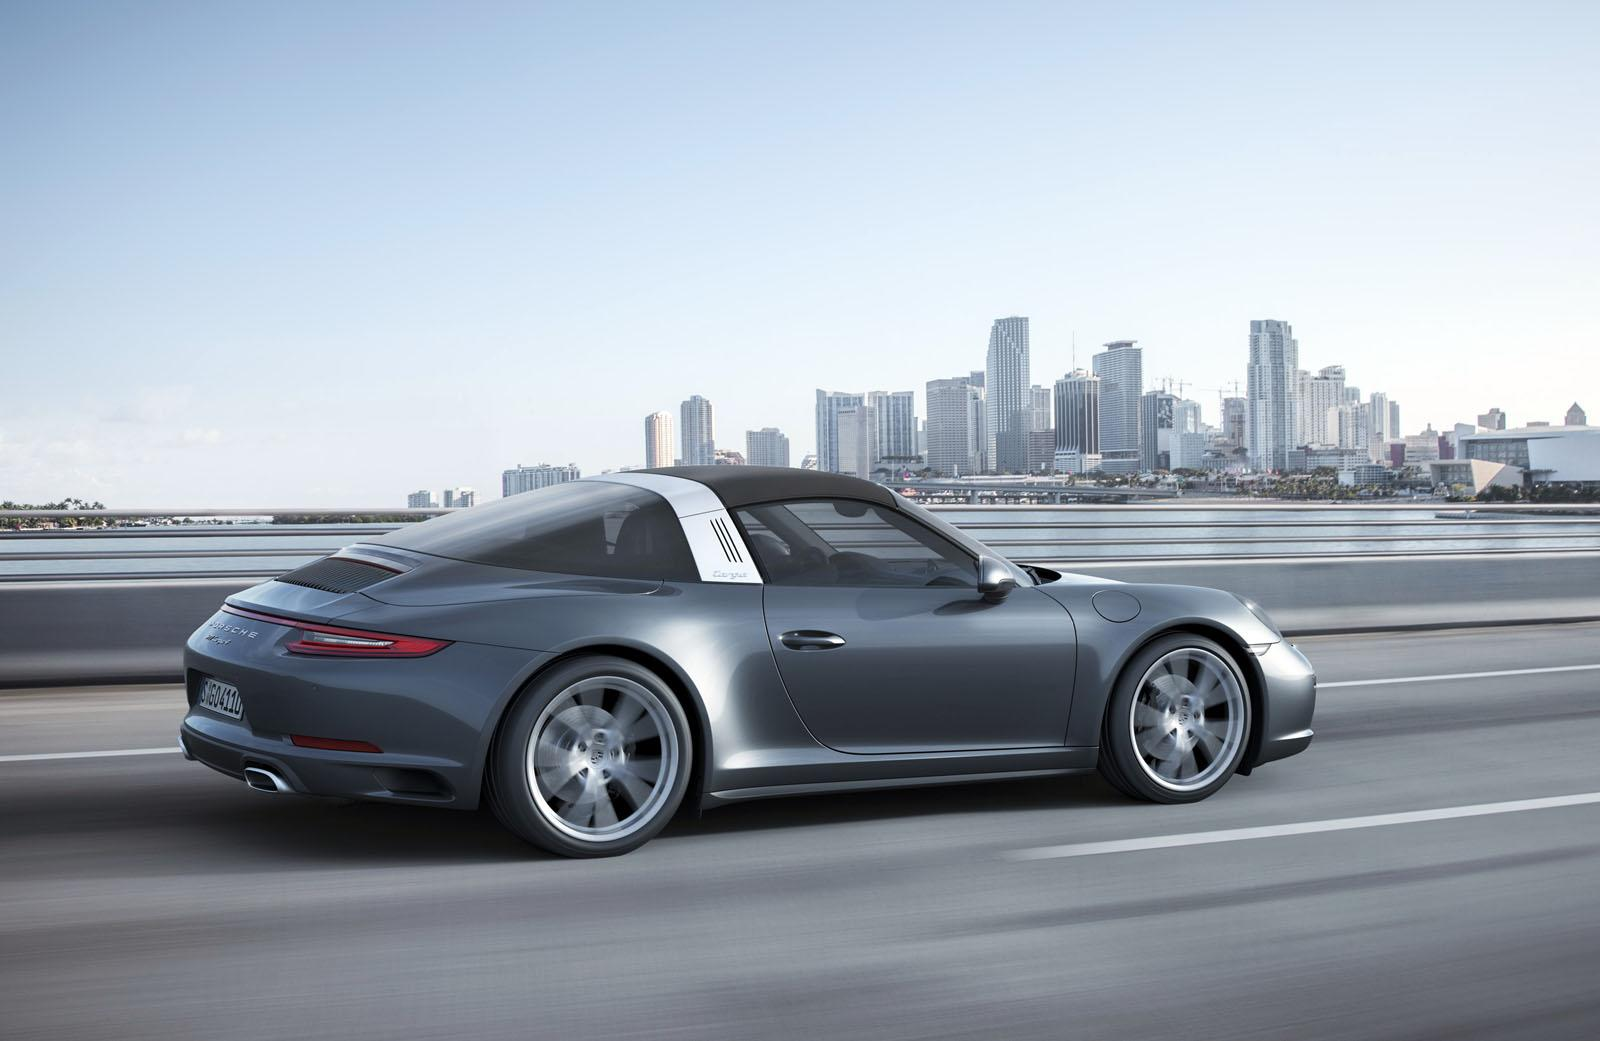 2017 porsche 911 carrera 4 targa 4 receive 911 turbo s smart awd now faster than carrera s. Black Bedroom Furniture Sets. Home Design Ideas